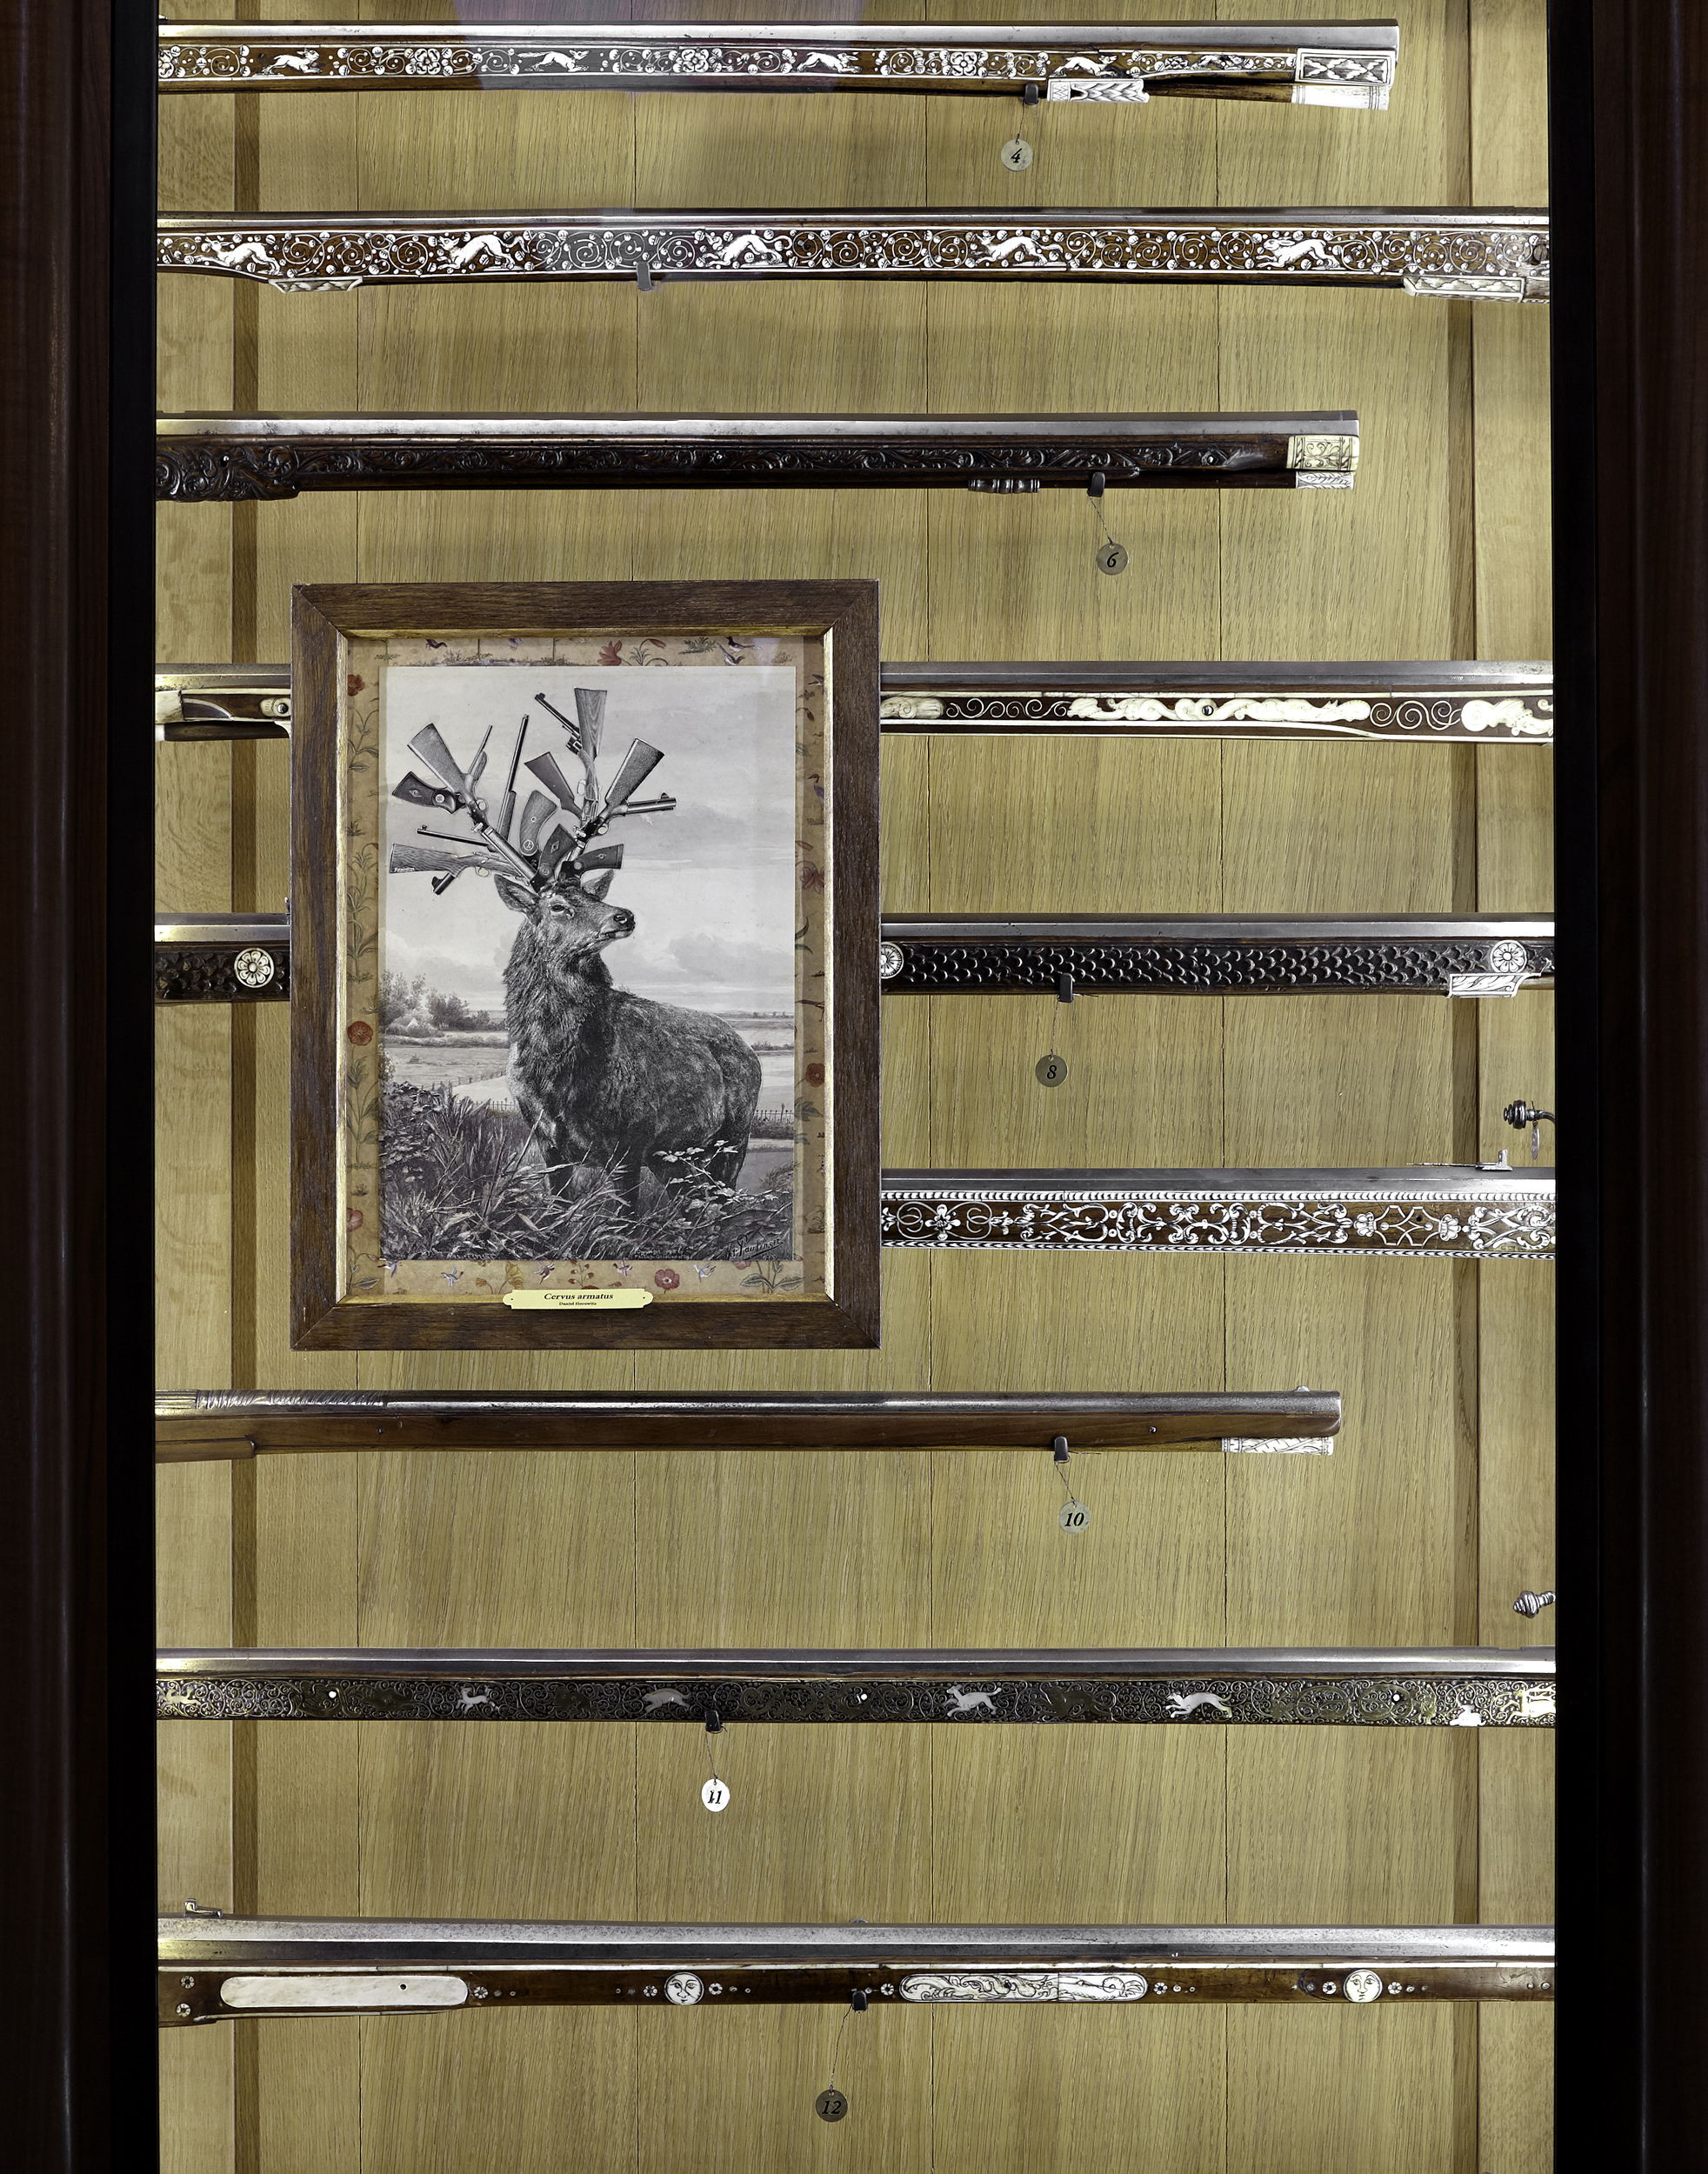 Cervus armatus - Horowitz - 28 x 38 -2_Depasquale.jpg